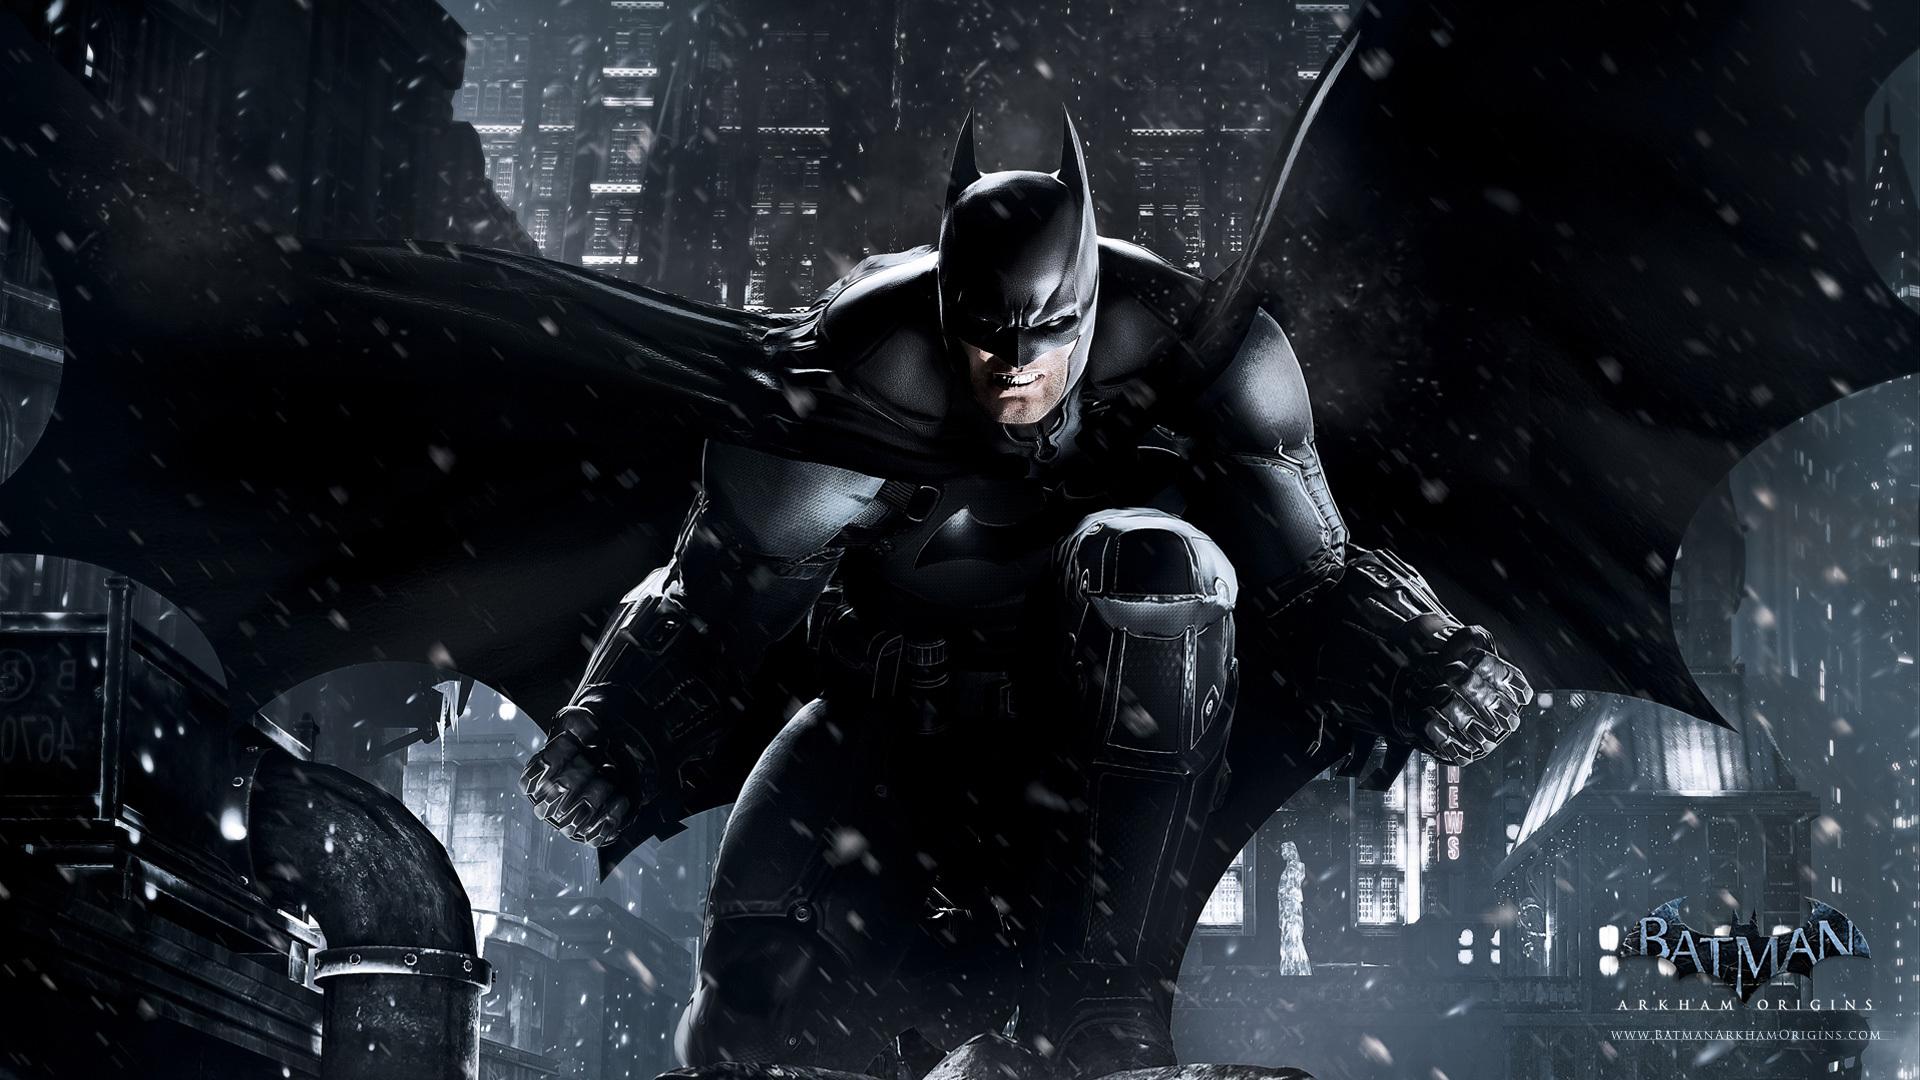 BROWSE batman hd wallpapers 1080p download  HD Photo Wallpaper 1920x1080